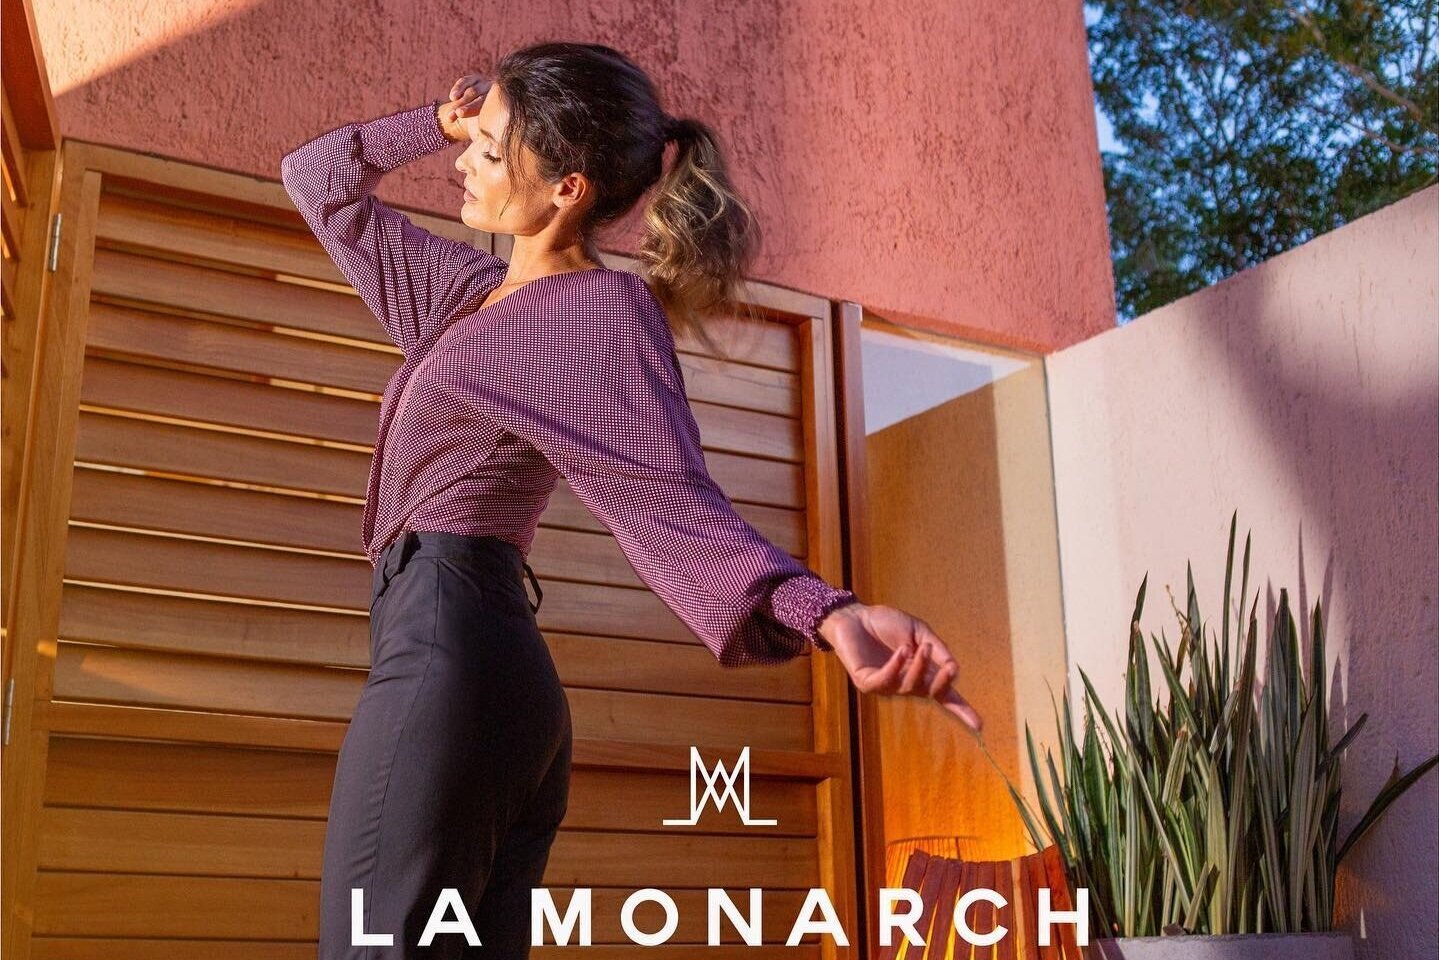 Canadian Entrepreneur Launches La Monarch Fashion Brand At An Unprecedented Time